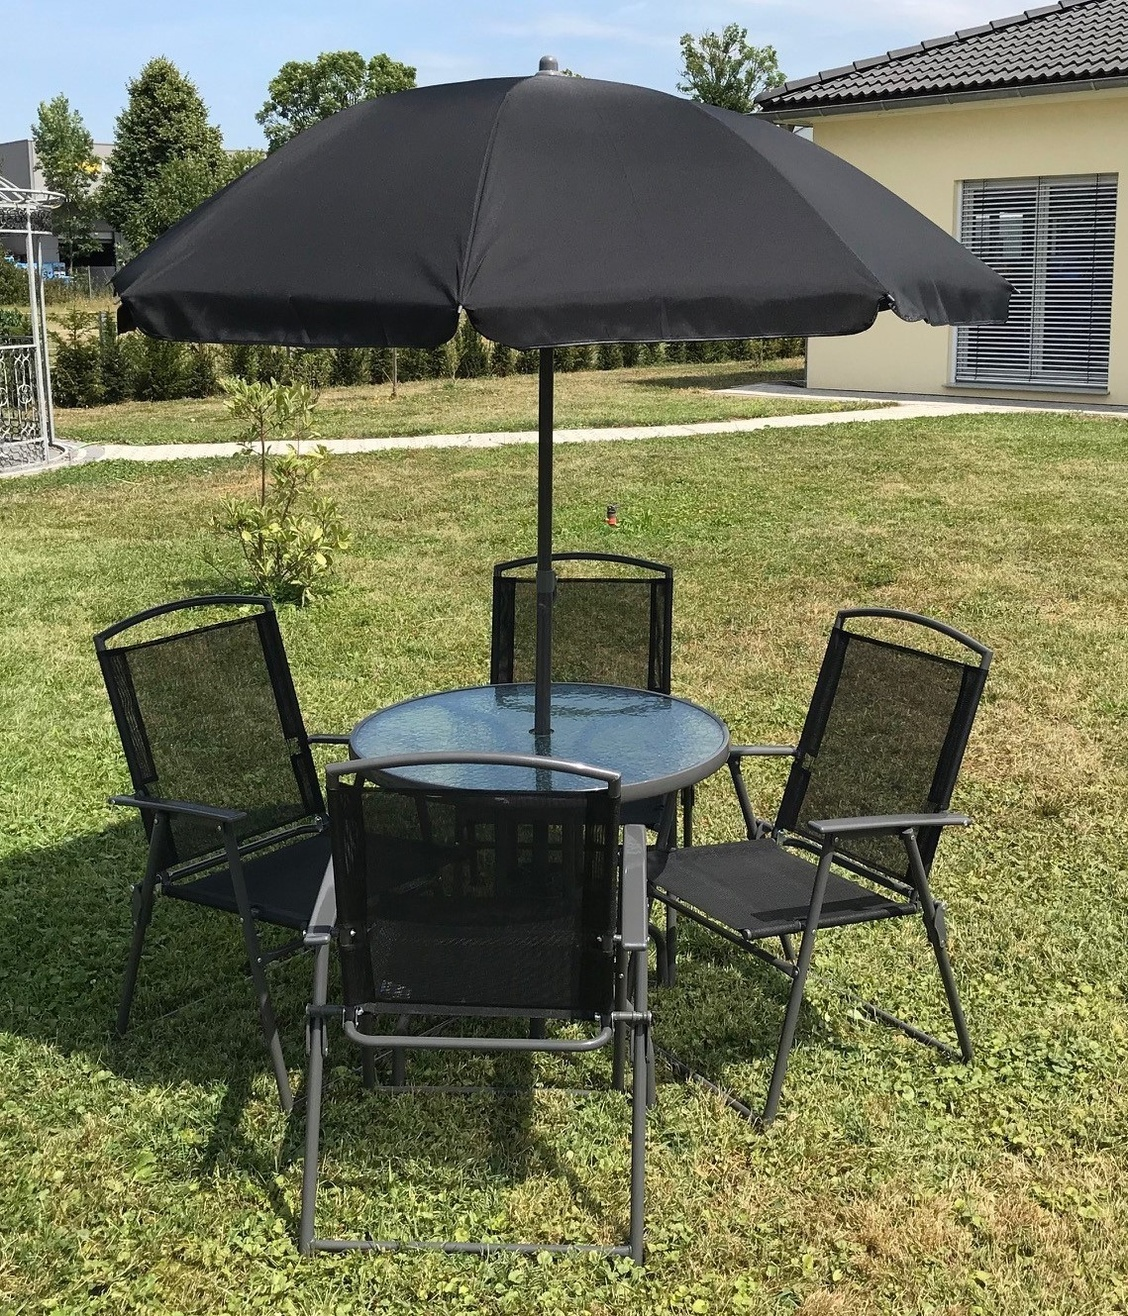 Vcm 6 Teiliges Gartenmobel Set Tisch Stuhle Schirm Vcm